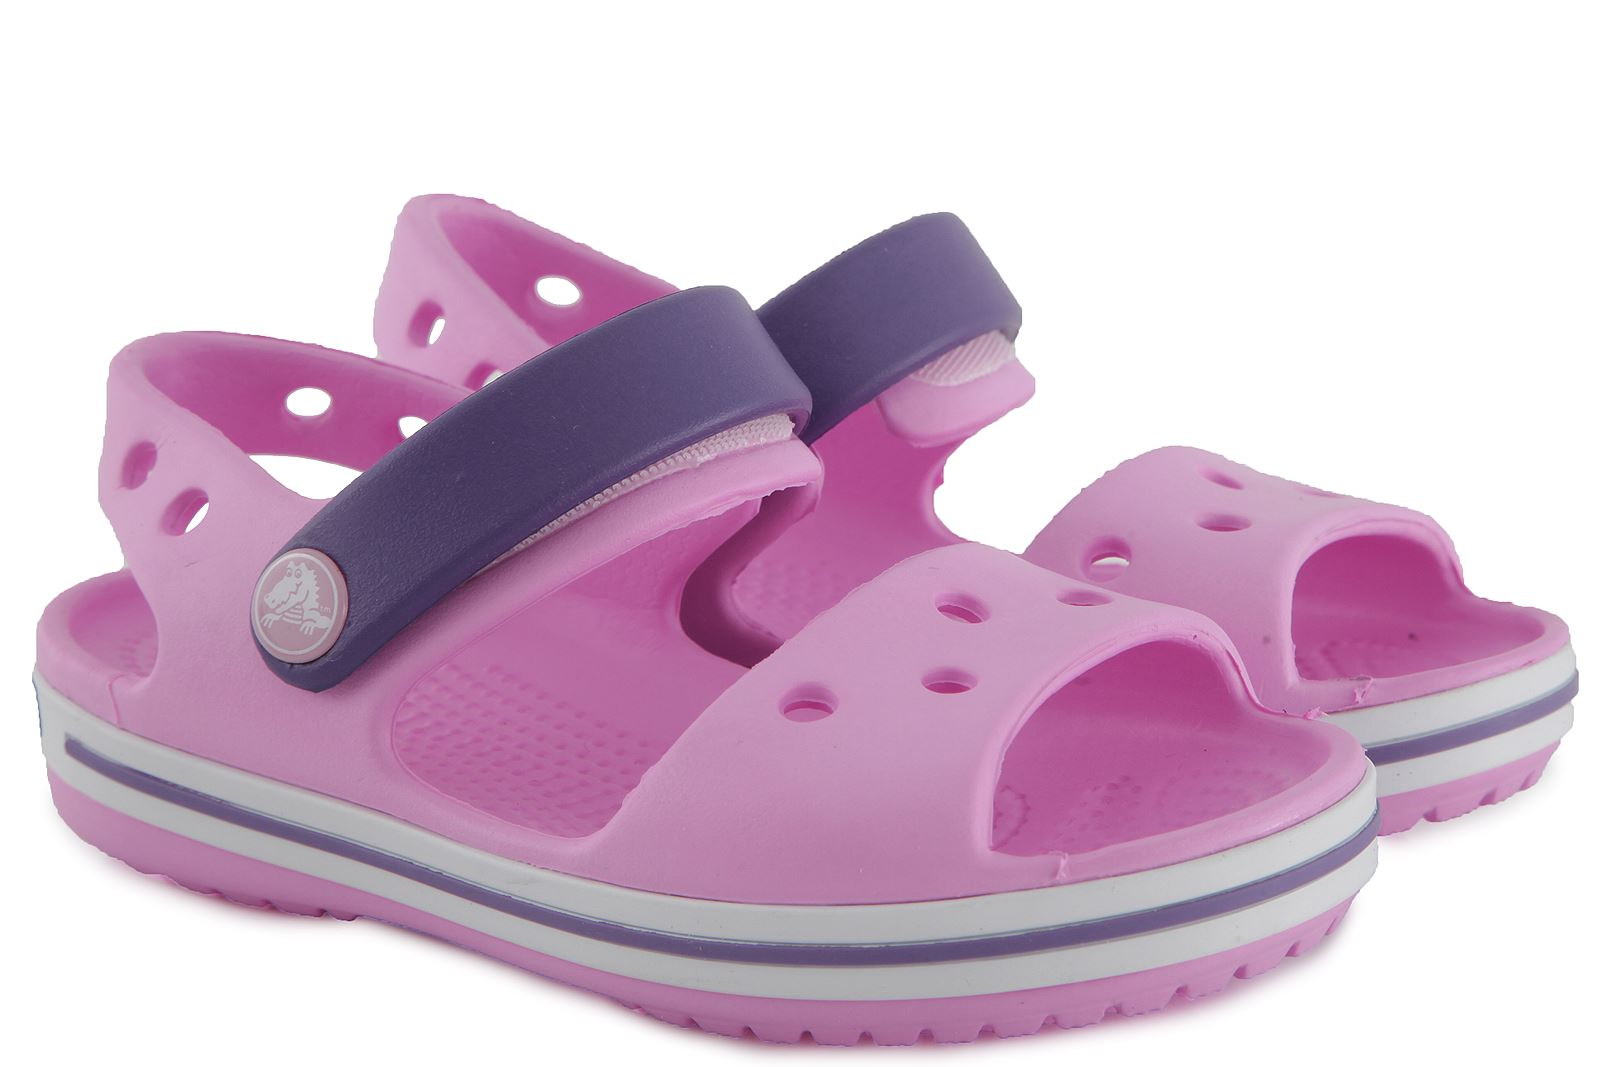 9227afc4246 Παιδικά μποτάκια CROCS σε χρώματα E35019Α - HappyEarth